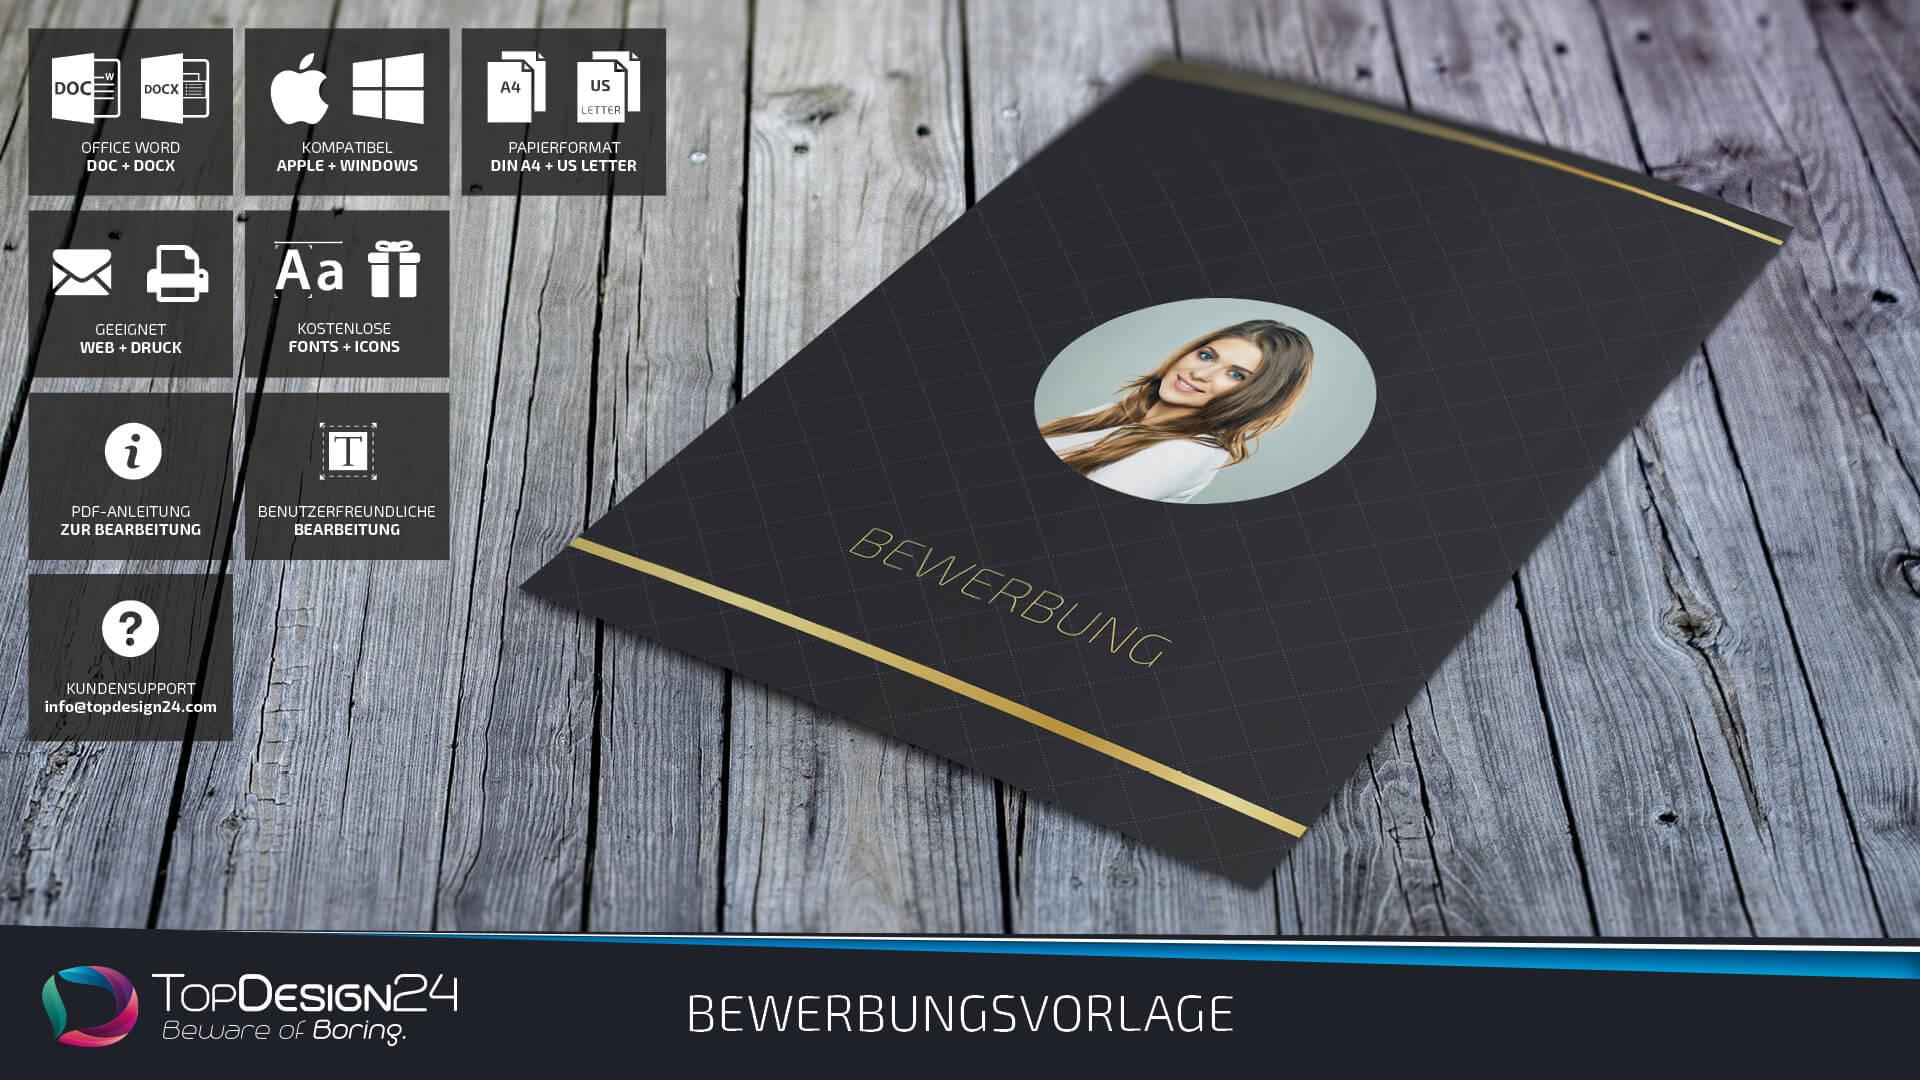 kreative bewerbung deckblatt indesign 2017 topdesign24. Black Bedroom Furniture Sets. Home Design Ideas